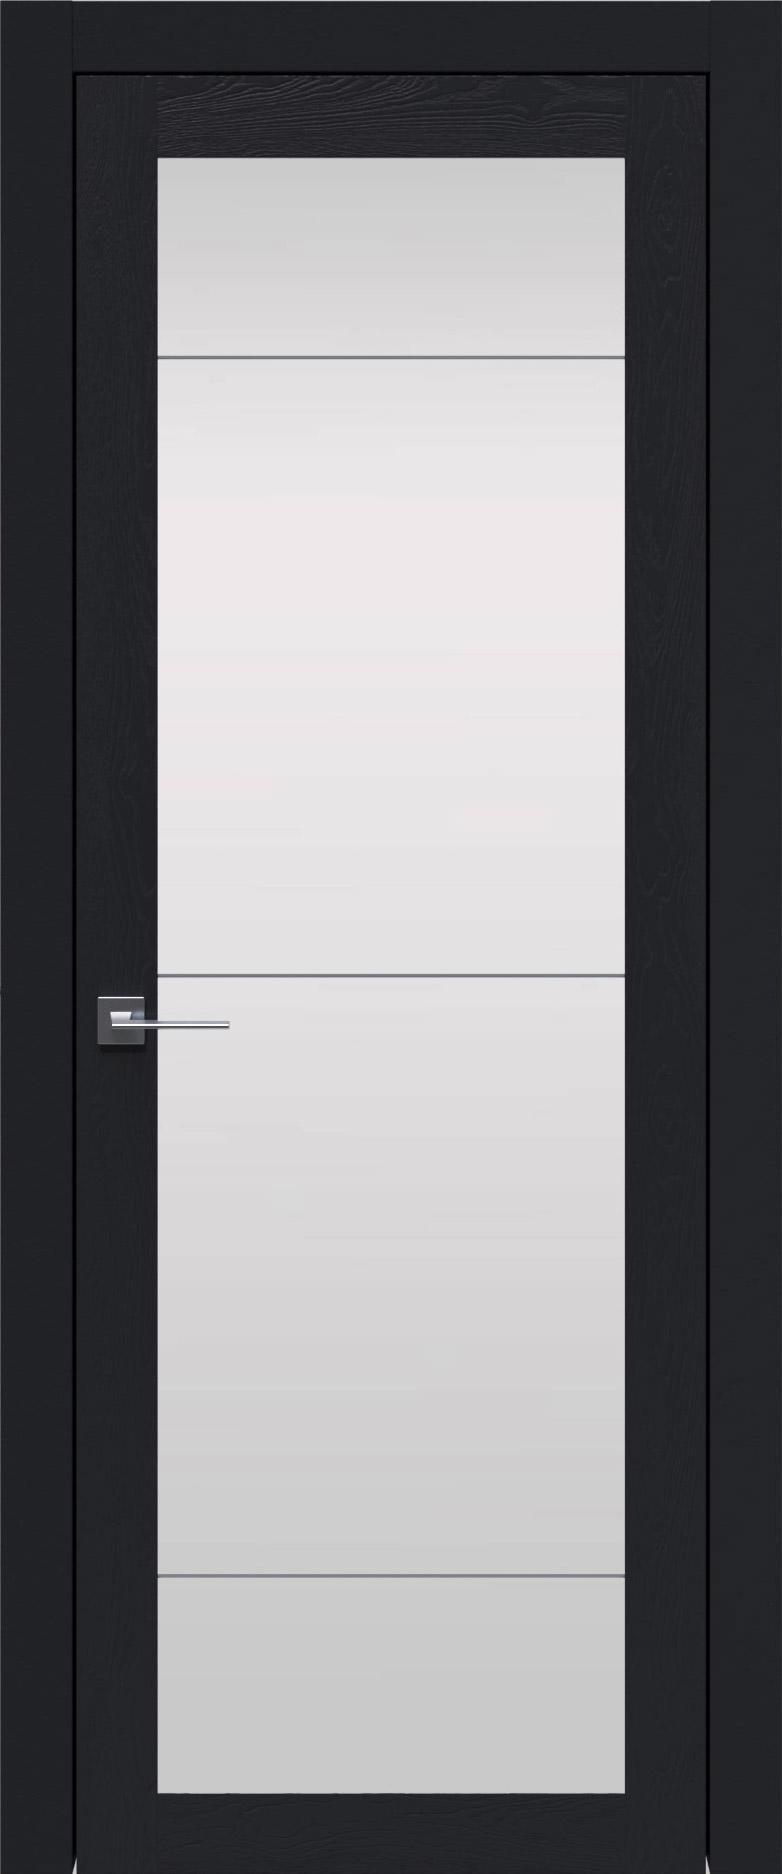 Tivoli З-3 цвет - Черная эмаль по шпону (RAL 9004) Со стеклом (ДО)